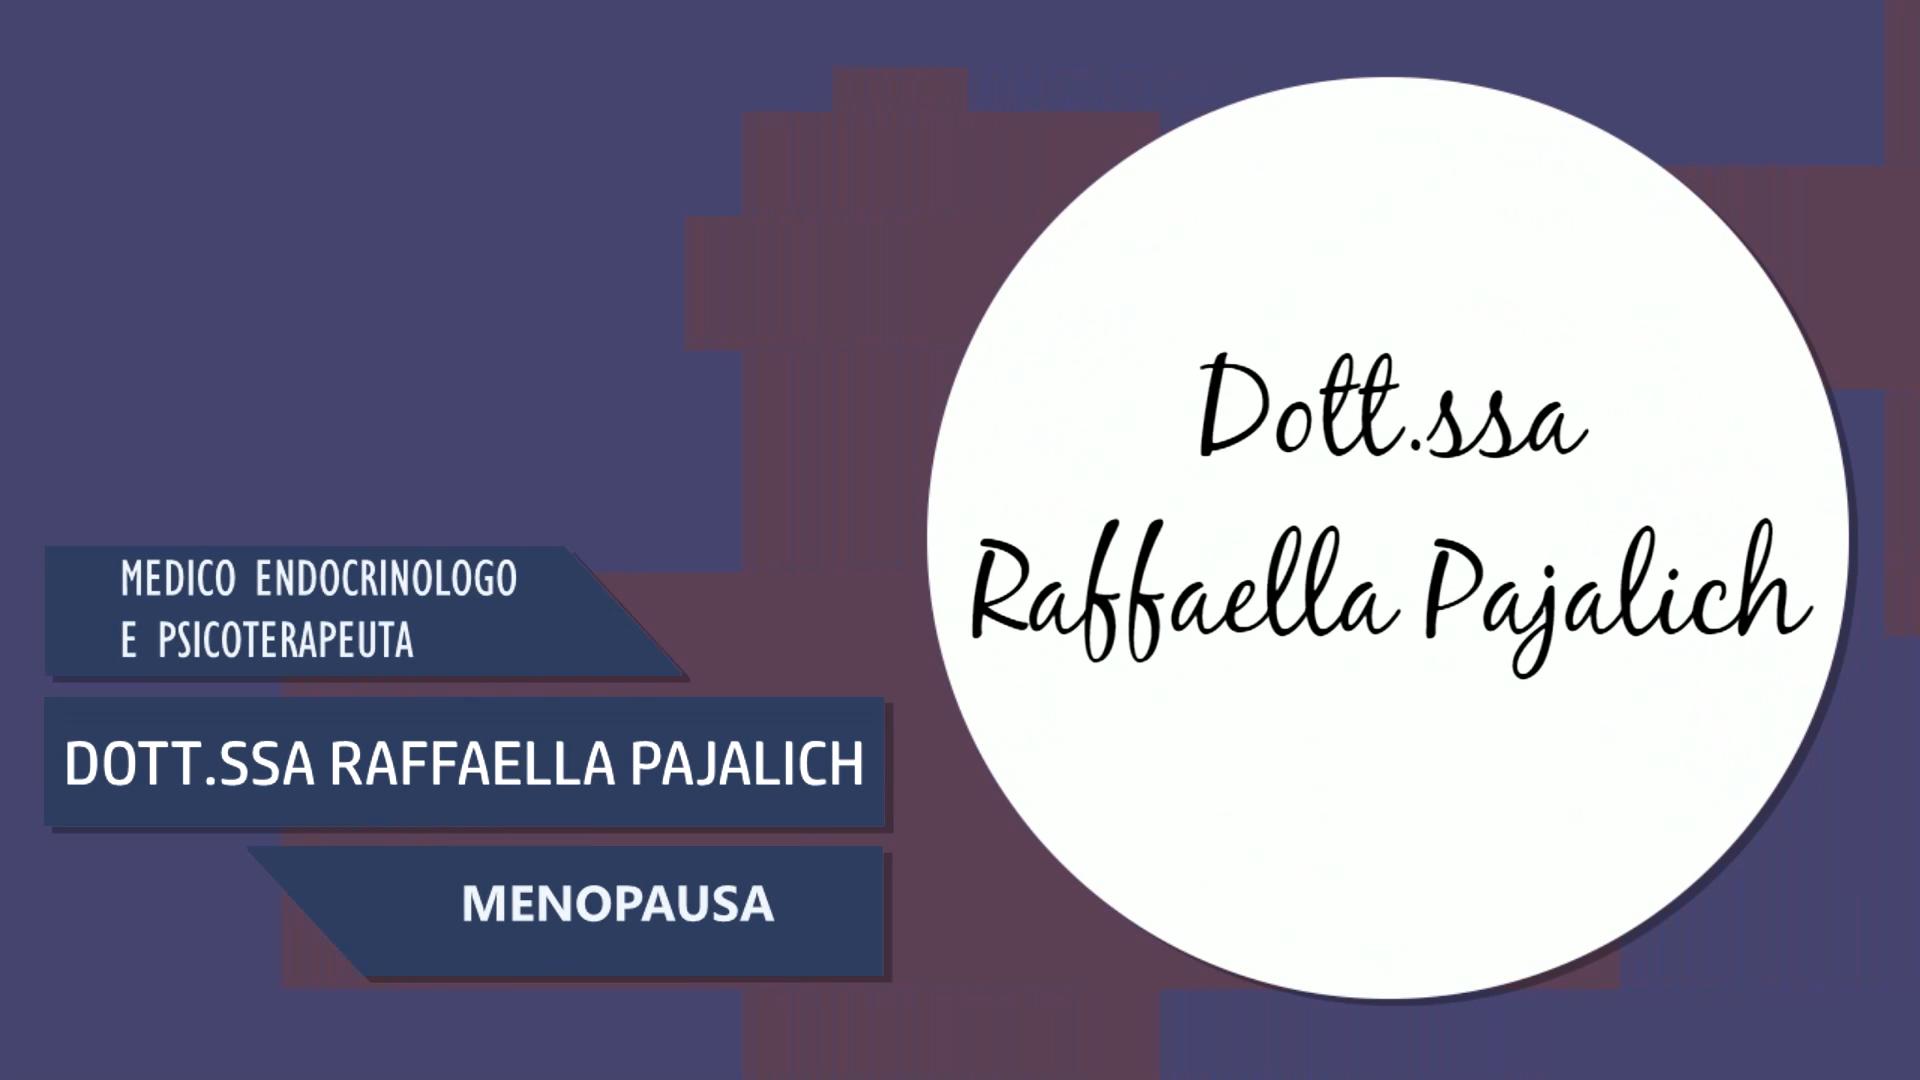 Intervista alla Dott.ssa Raffaella Pajalich – Menopausa